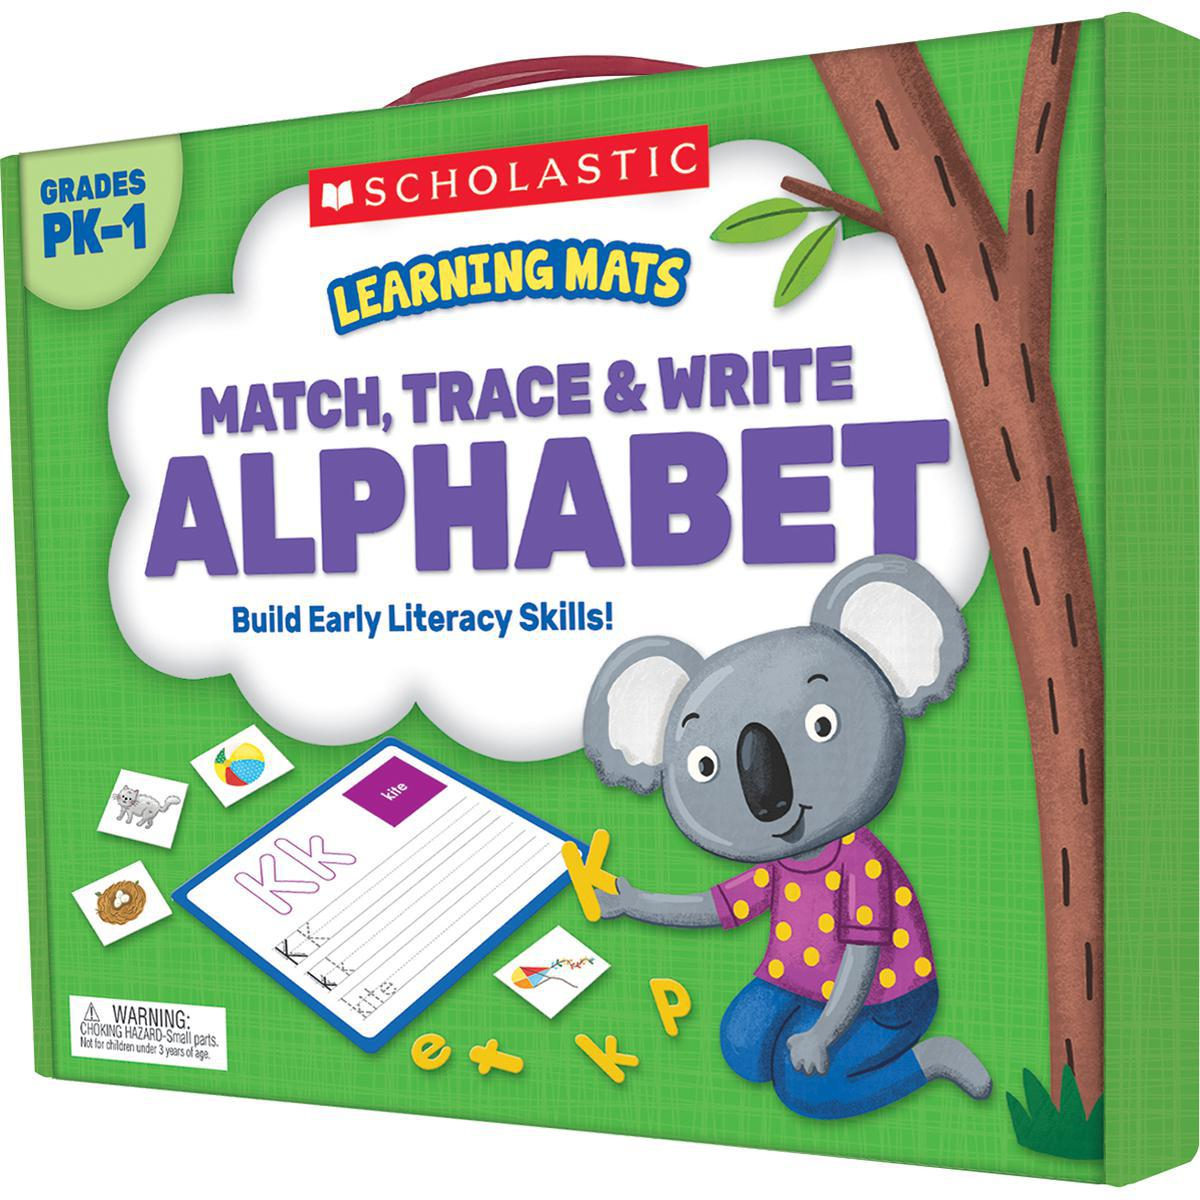 Learning Mats: Match, Trace & Write Alphabet